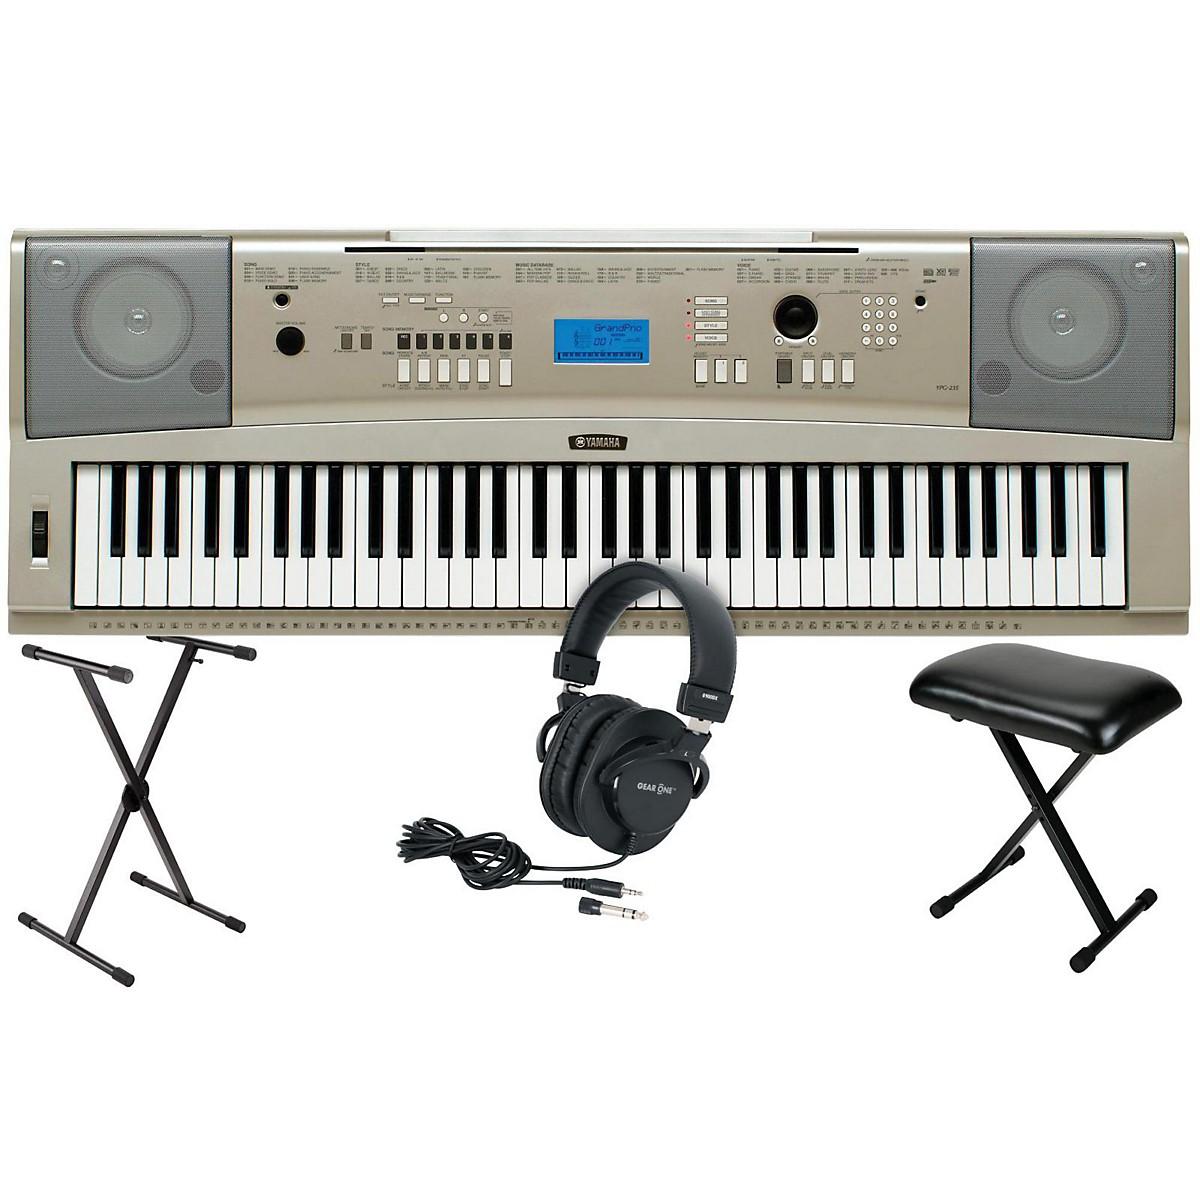 Yamaha YPG-235 76-Key Portable Grand Piano Keyboardwith Stand, Bench & Headphones